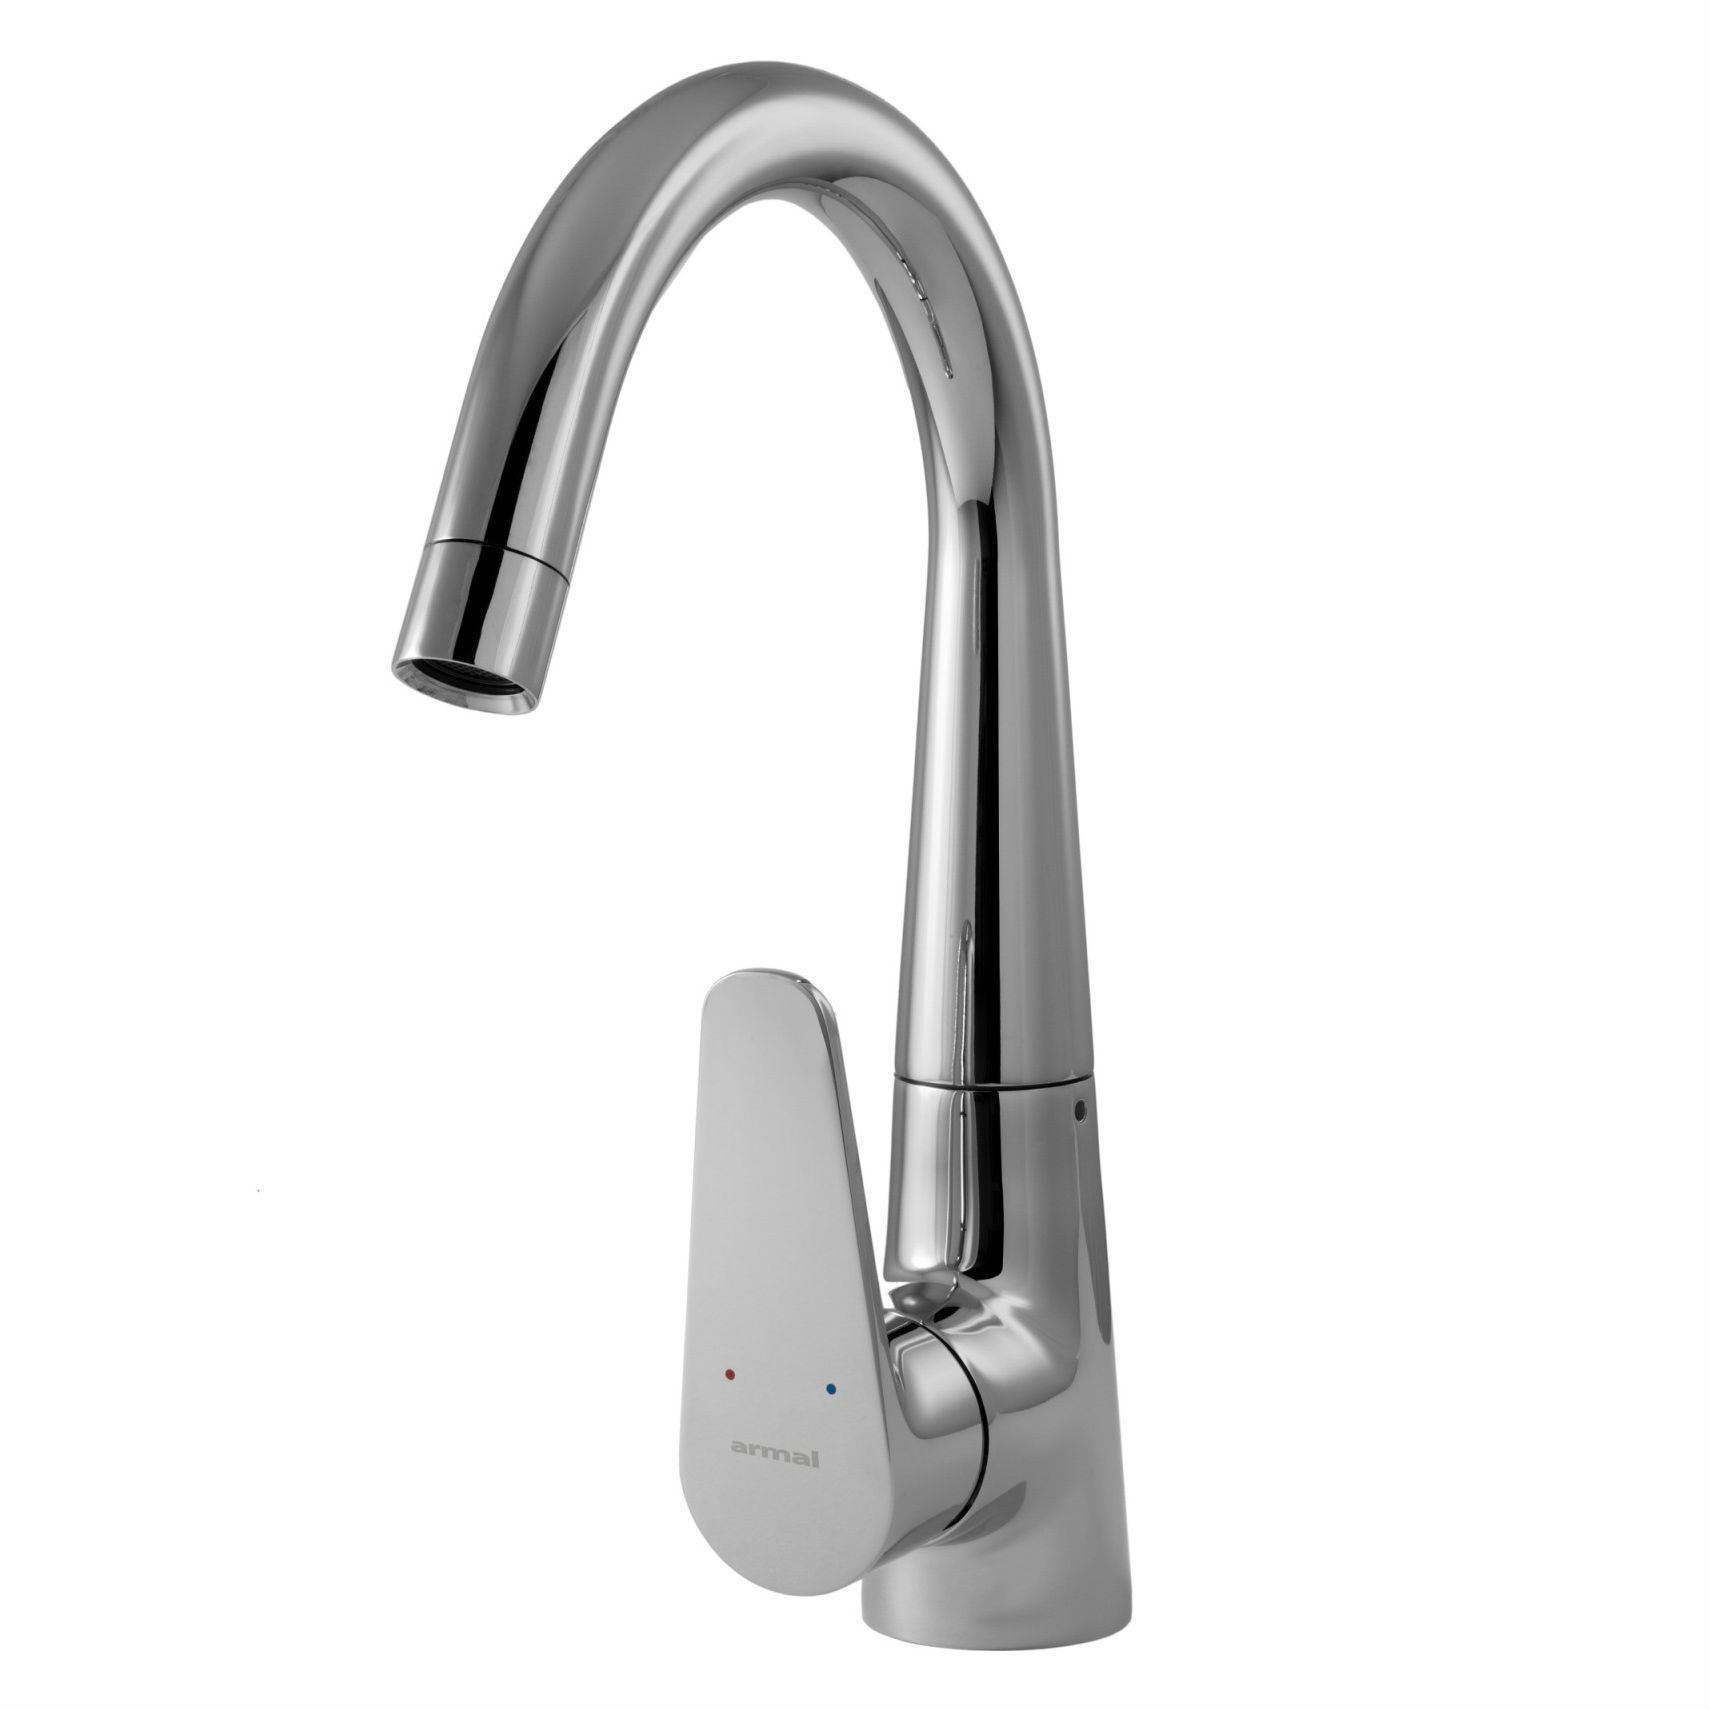 Slavina za kuhinjski sudoper